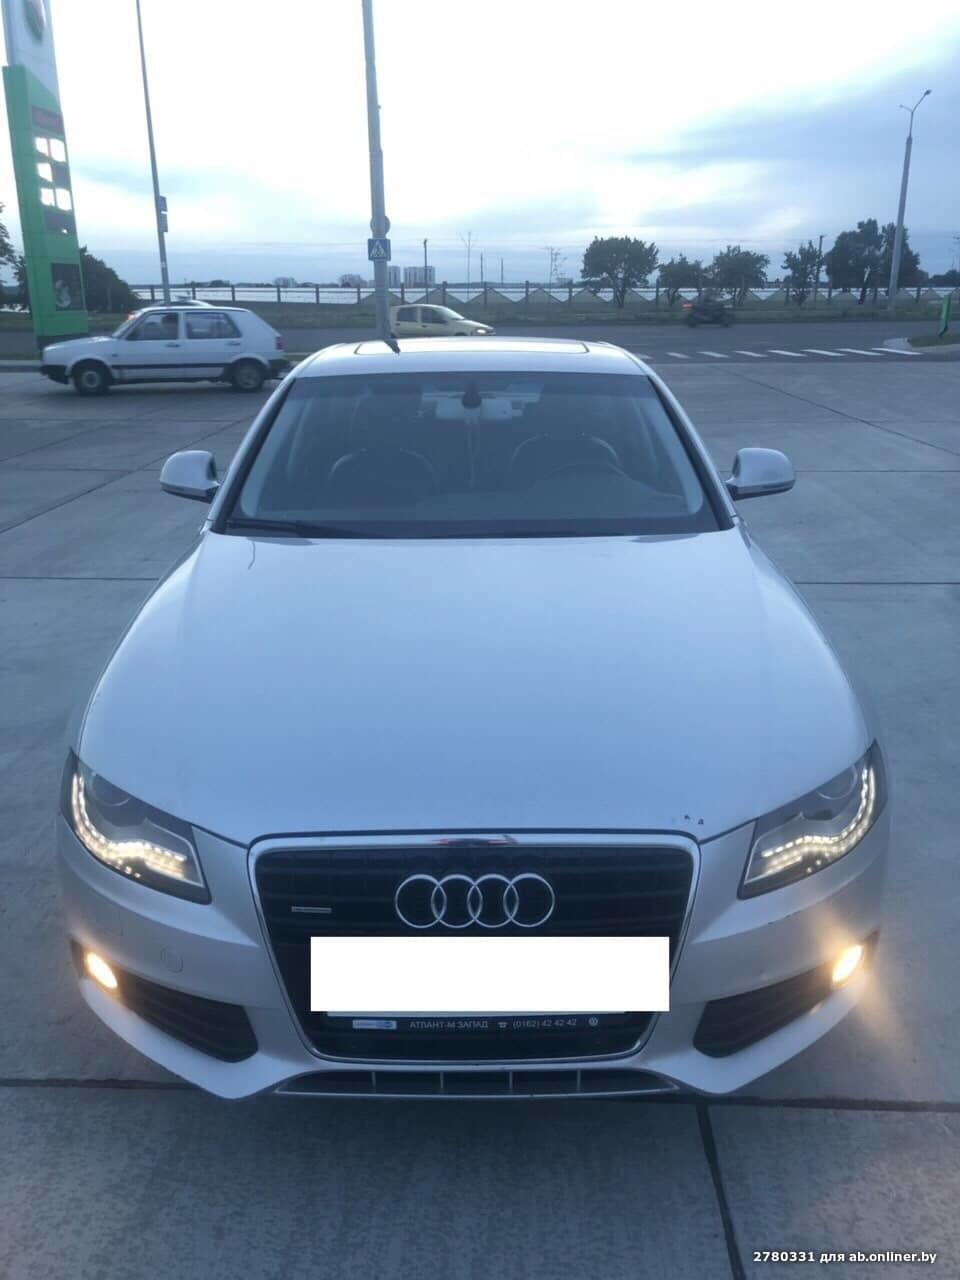 Audi A4 B8 S- Line Quattro